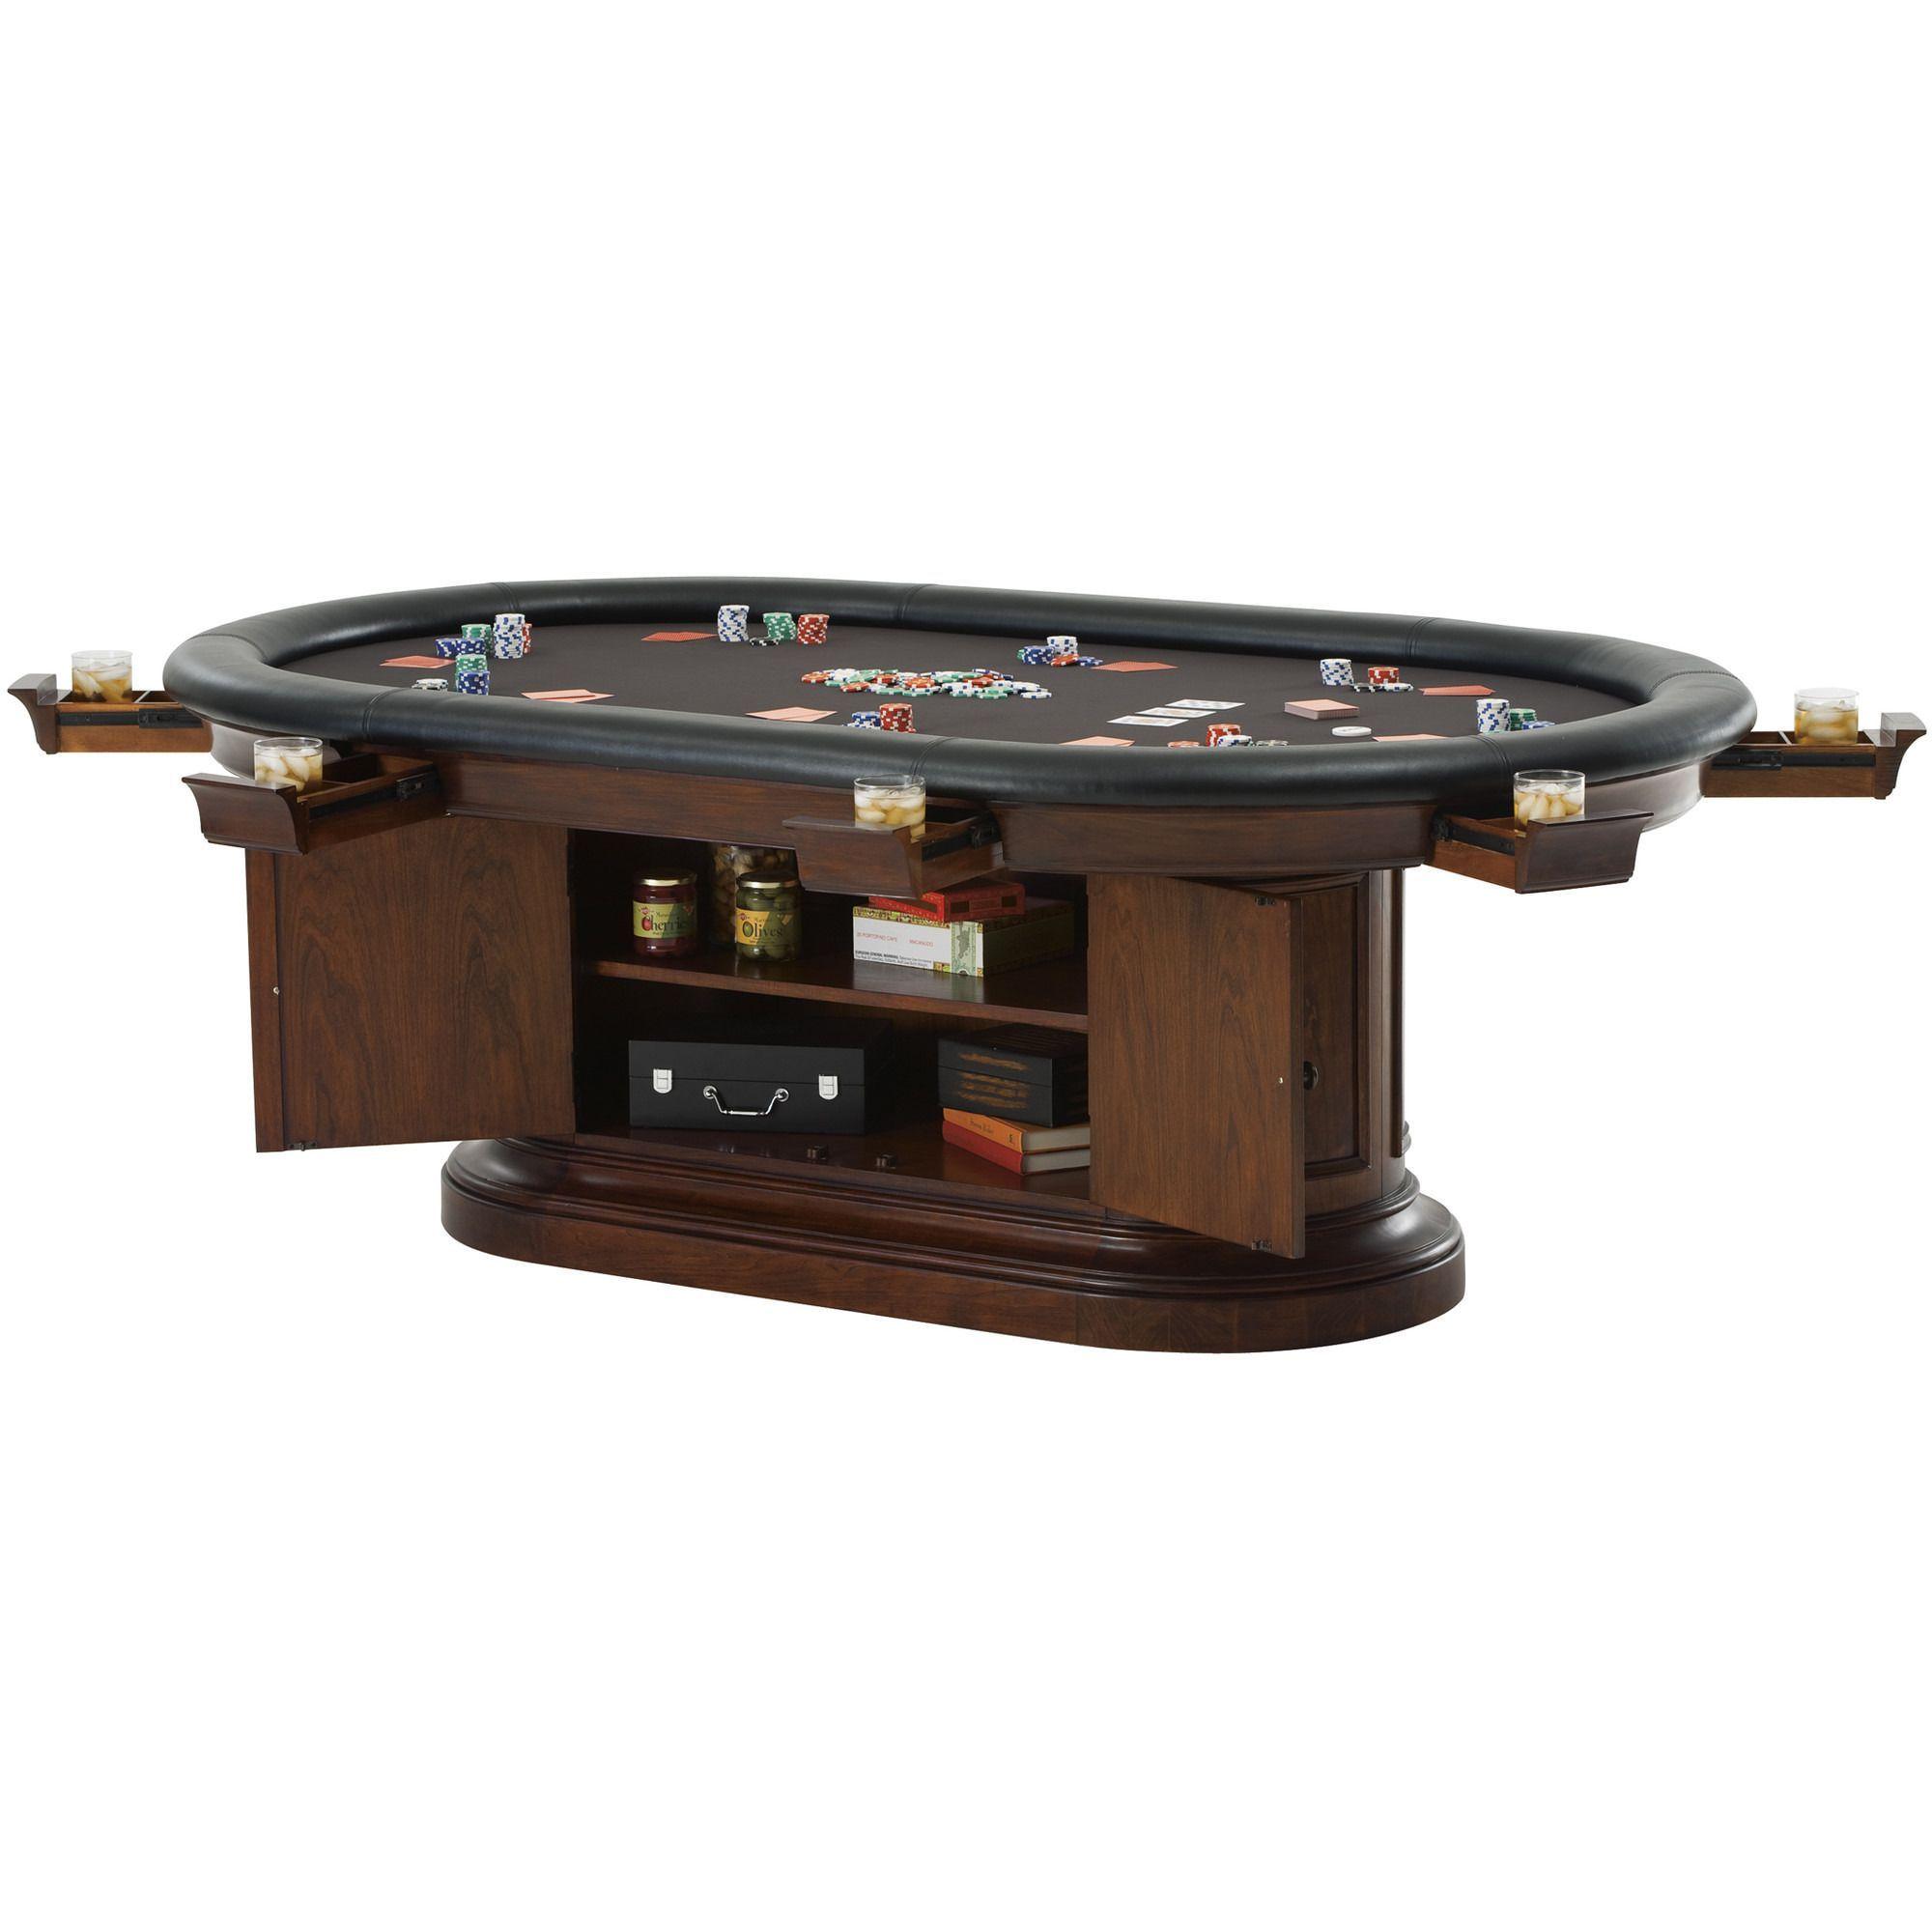 Bonavista Oval Poker Table By Howard Miller, In Rustic Cherry   Americana Poker  Tables